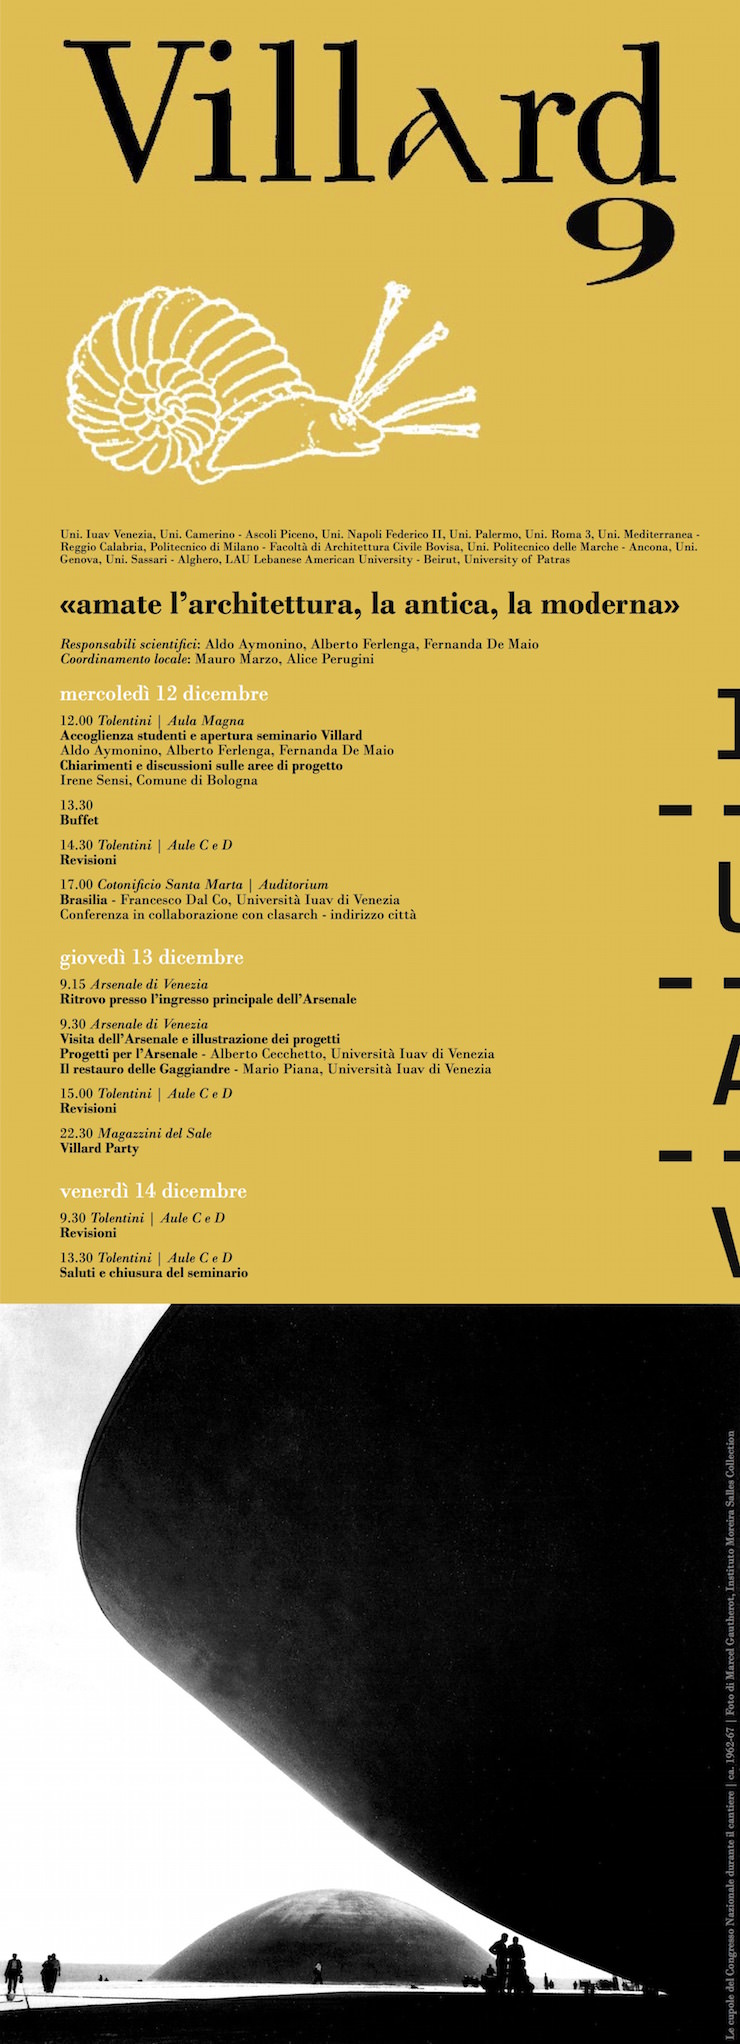 villard-9-venezia-programma